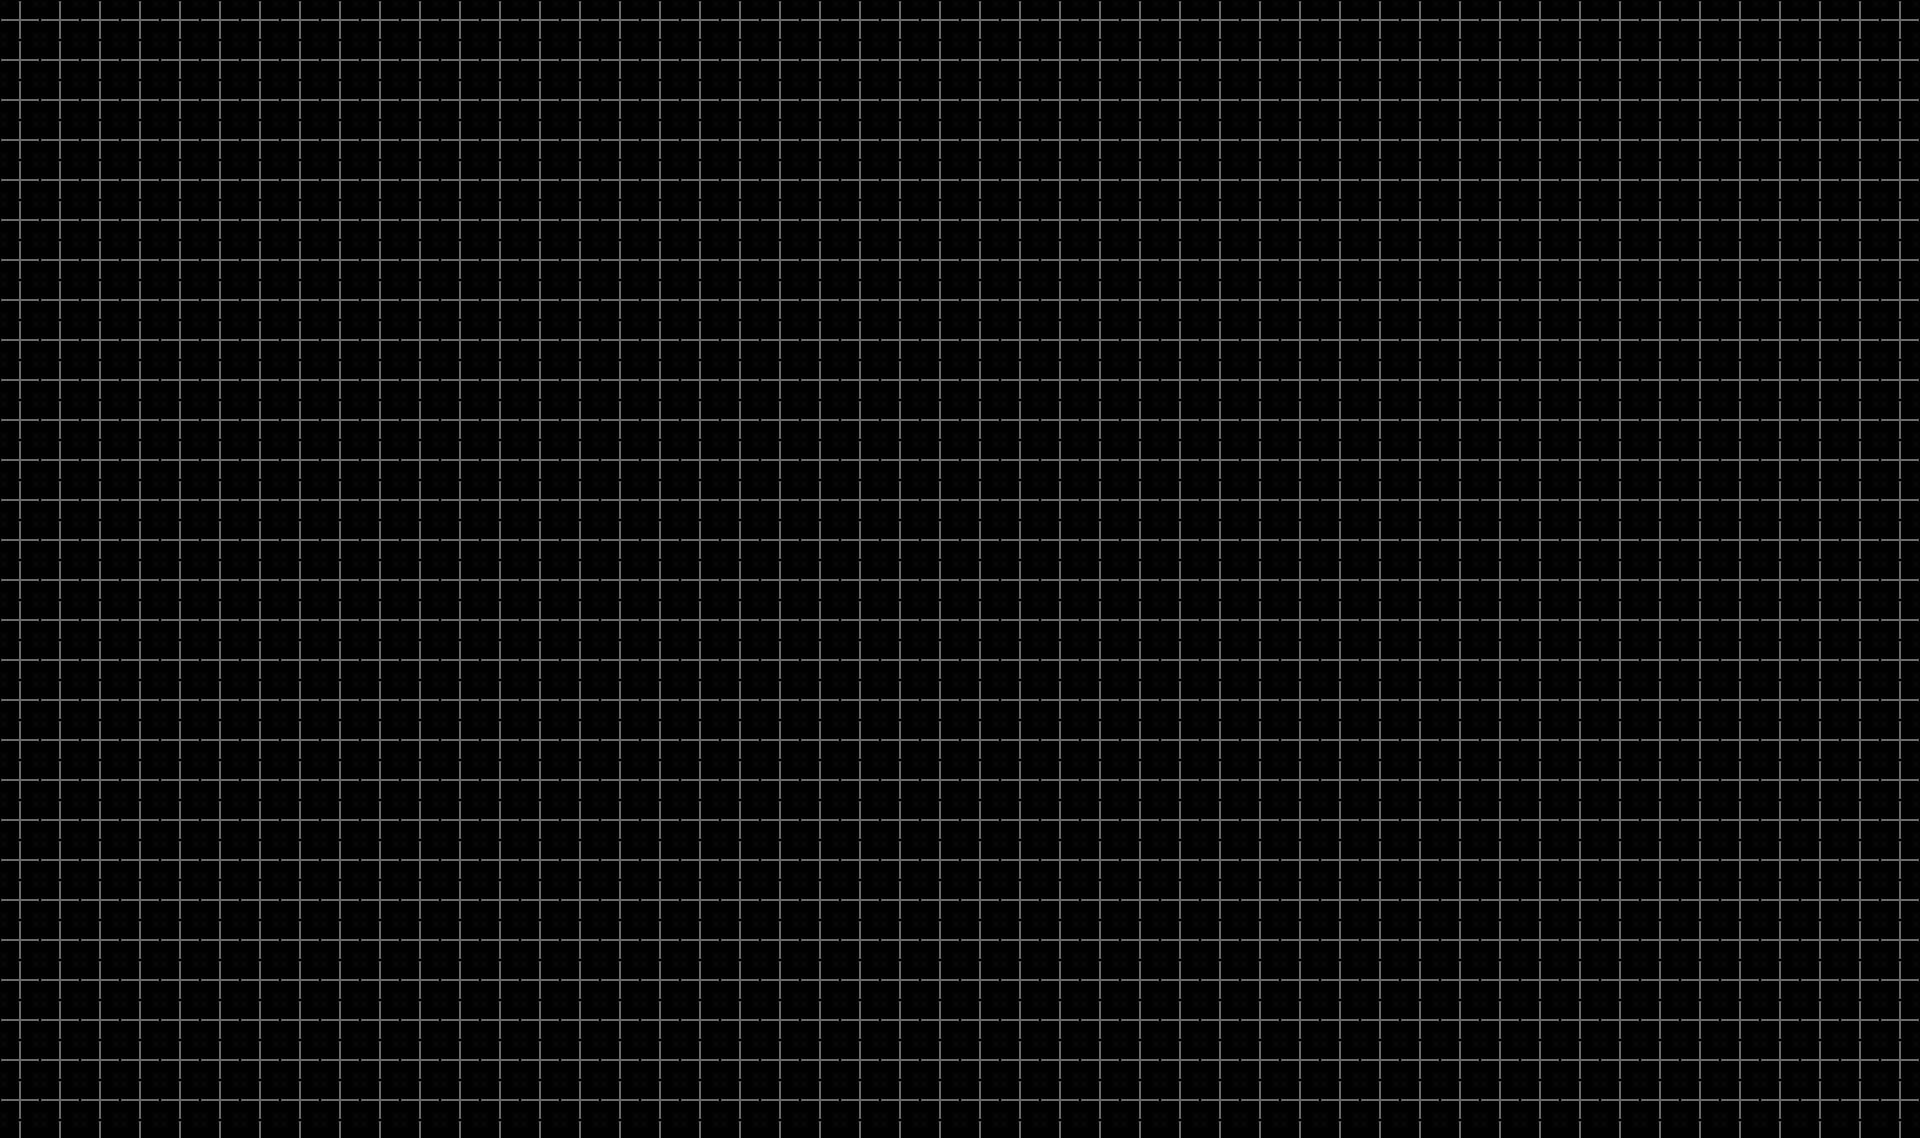 white grid inspirational 44 black grid wallpaper on wallpapersafari for you of white grid